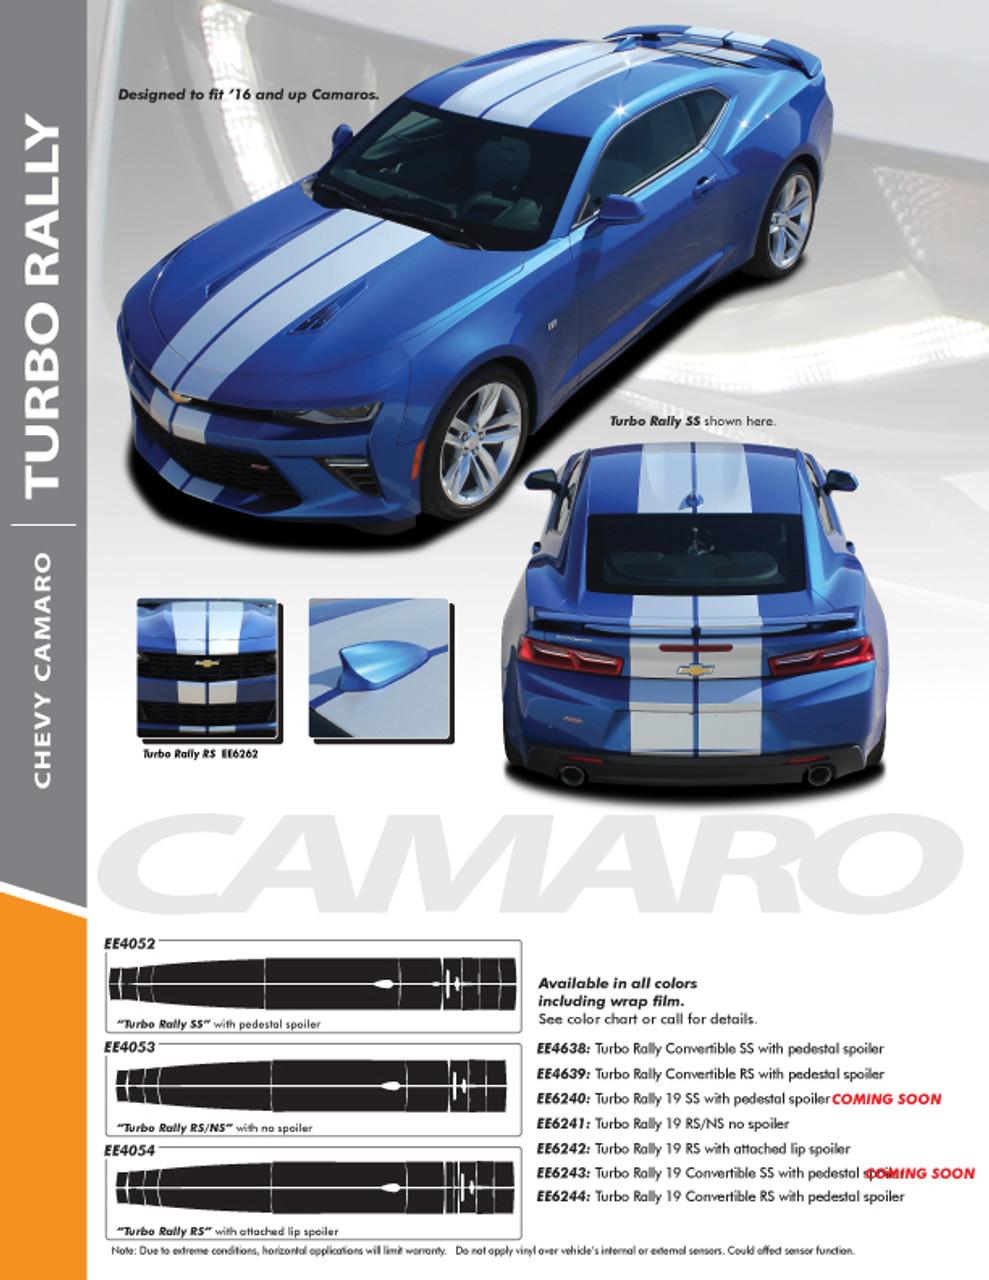 Decal Vinyl Hood Hash Fender Stripes for Chevrolet Camaro Sport SS RS Hood Lip